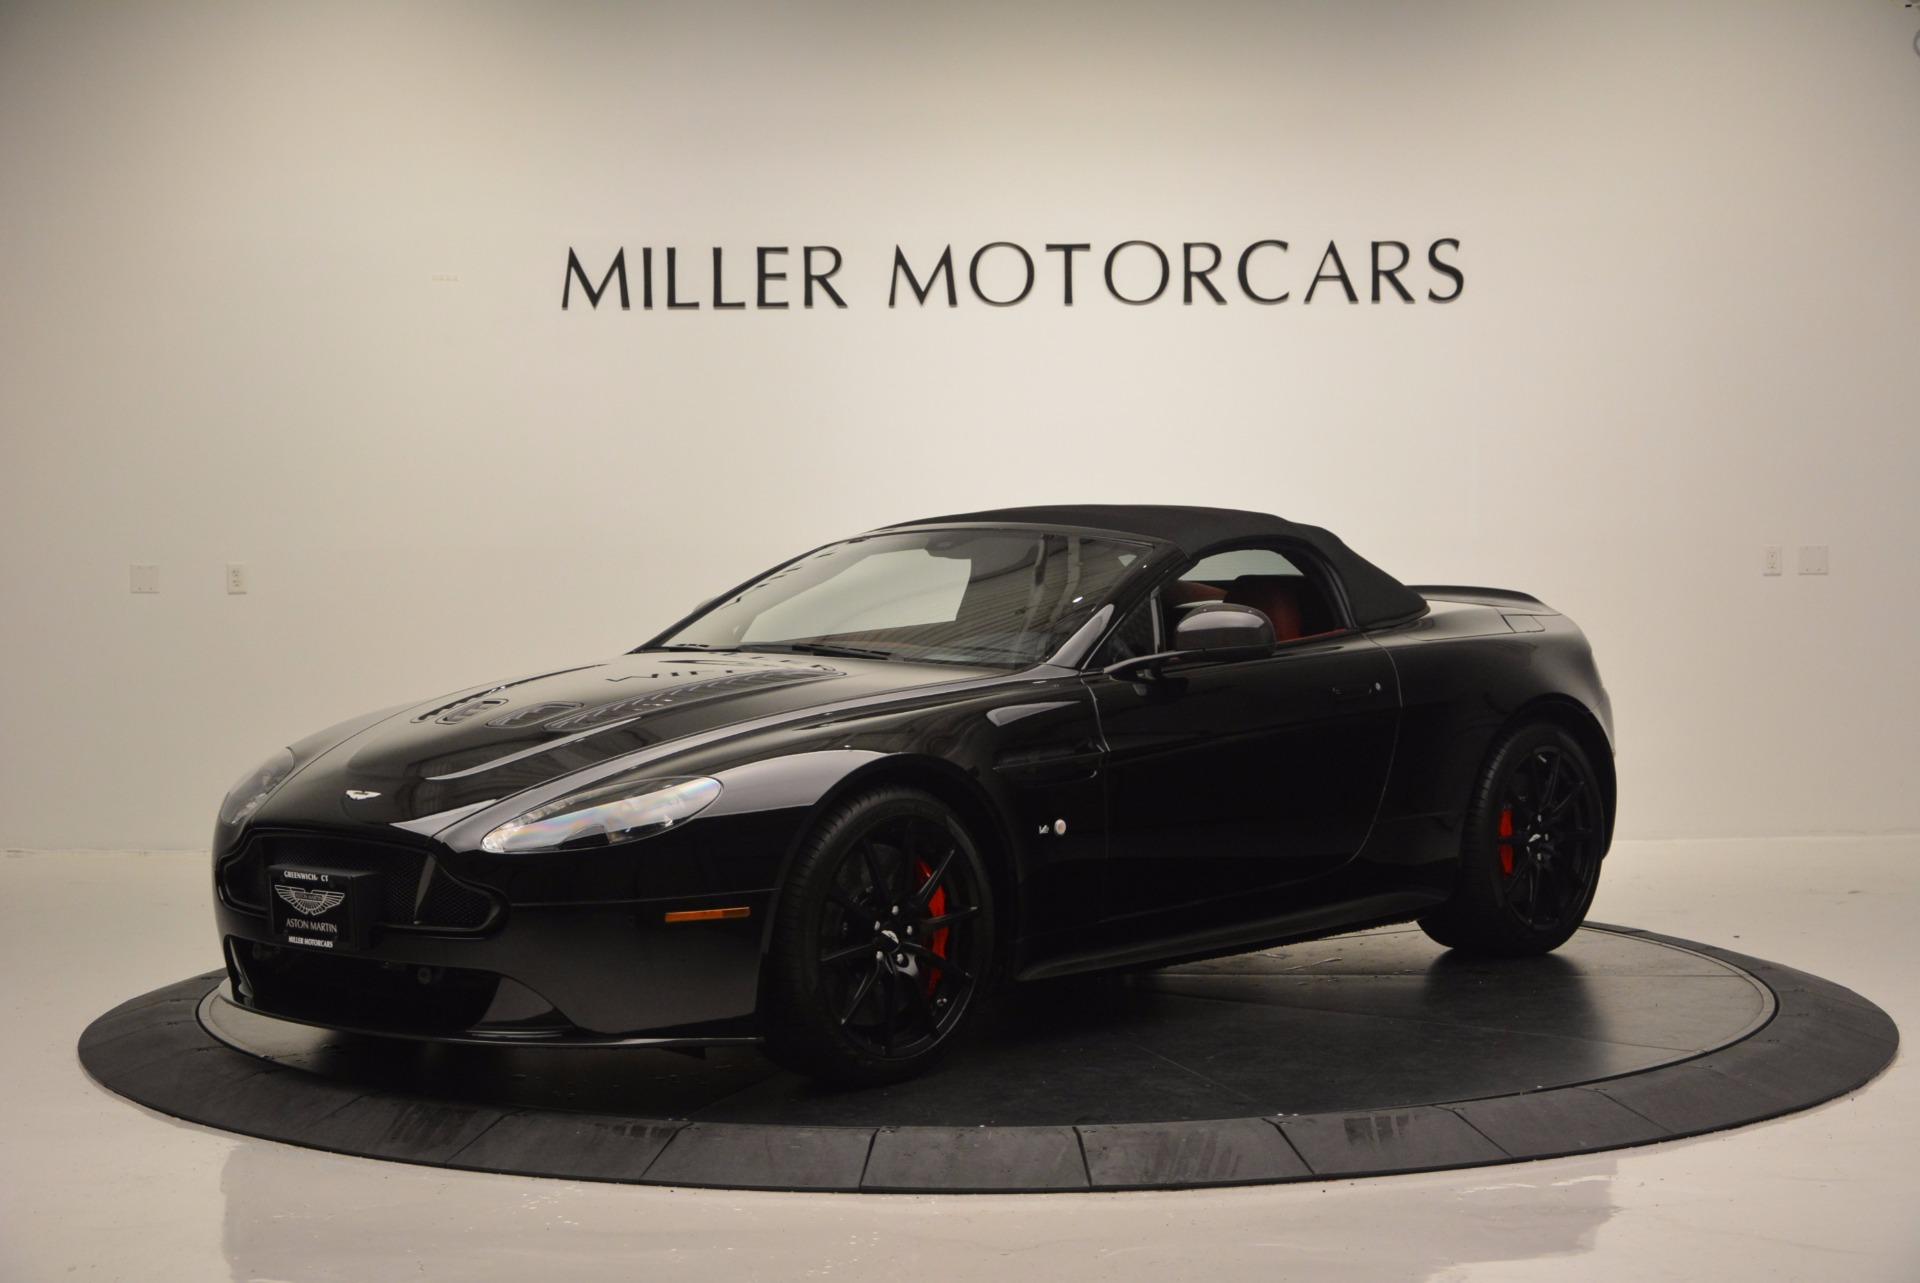 Used 2015 Aston Martin V12 Vantage S Roadster For Sale In Greenwich, CT. Alfa Romeo of Greenwich, 7227 1335_p14